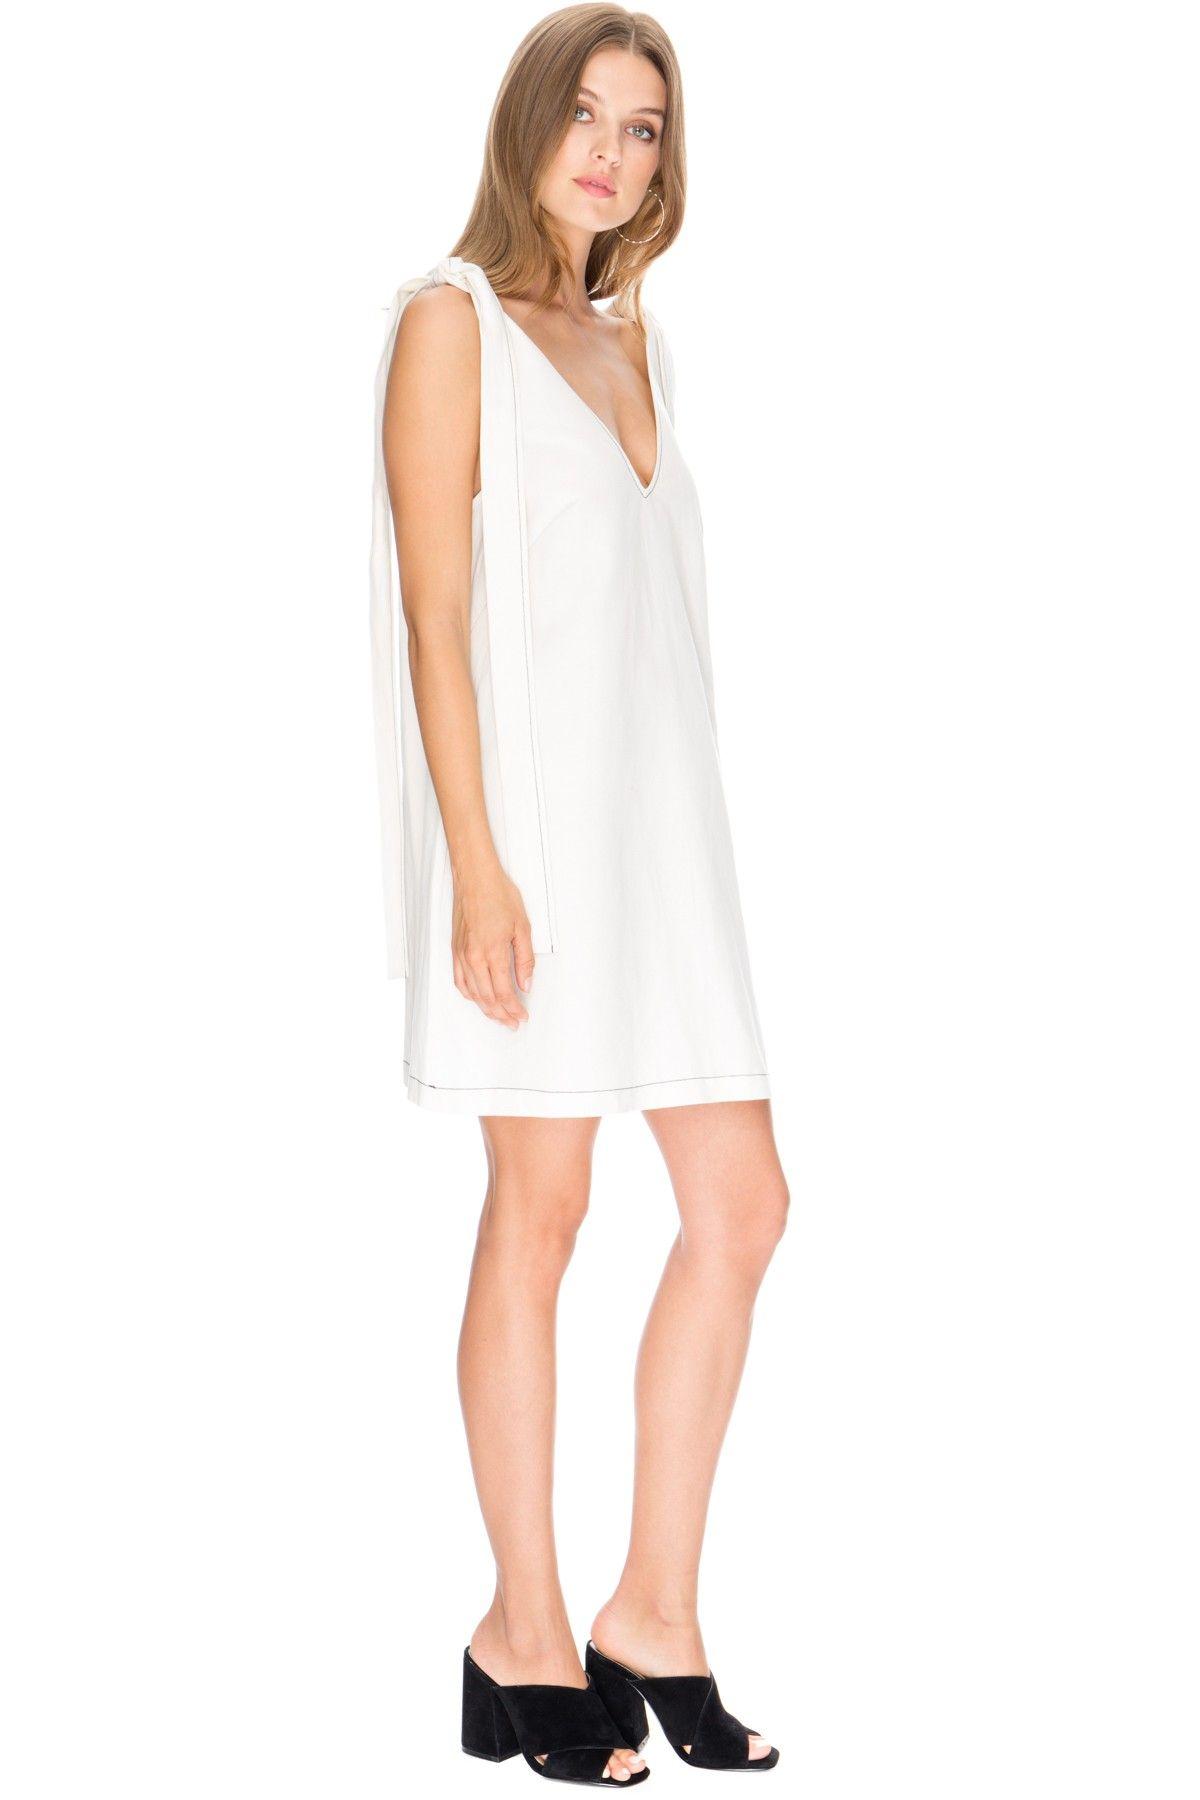 FINDERS KEEPERS PABLO DRESS CLOUD - BNKR